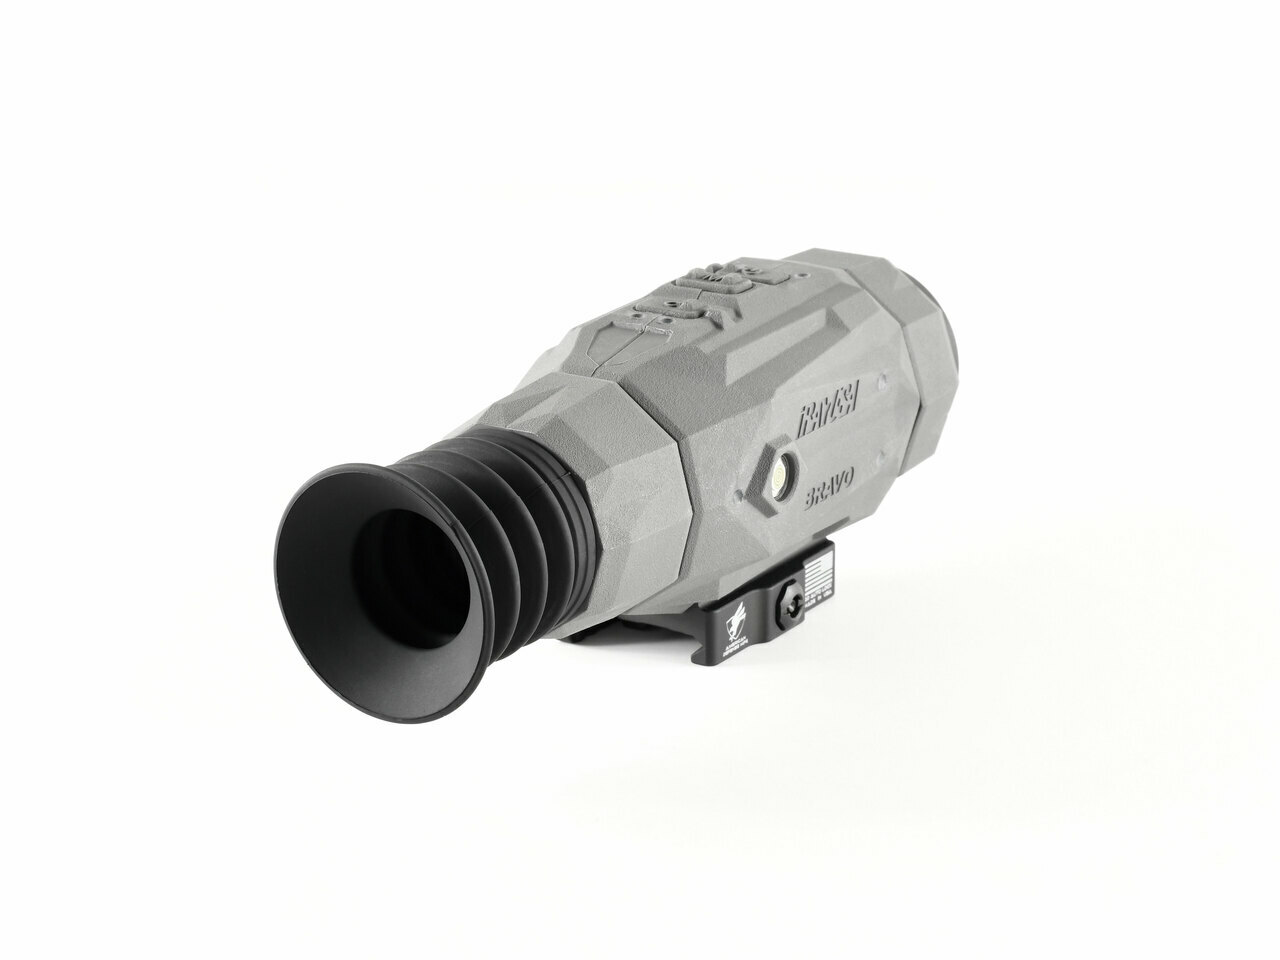 iray usa rico bravo thermal weapon sight thermal scope hog hunter night vision